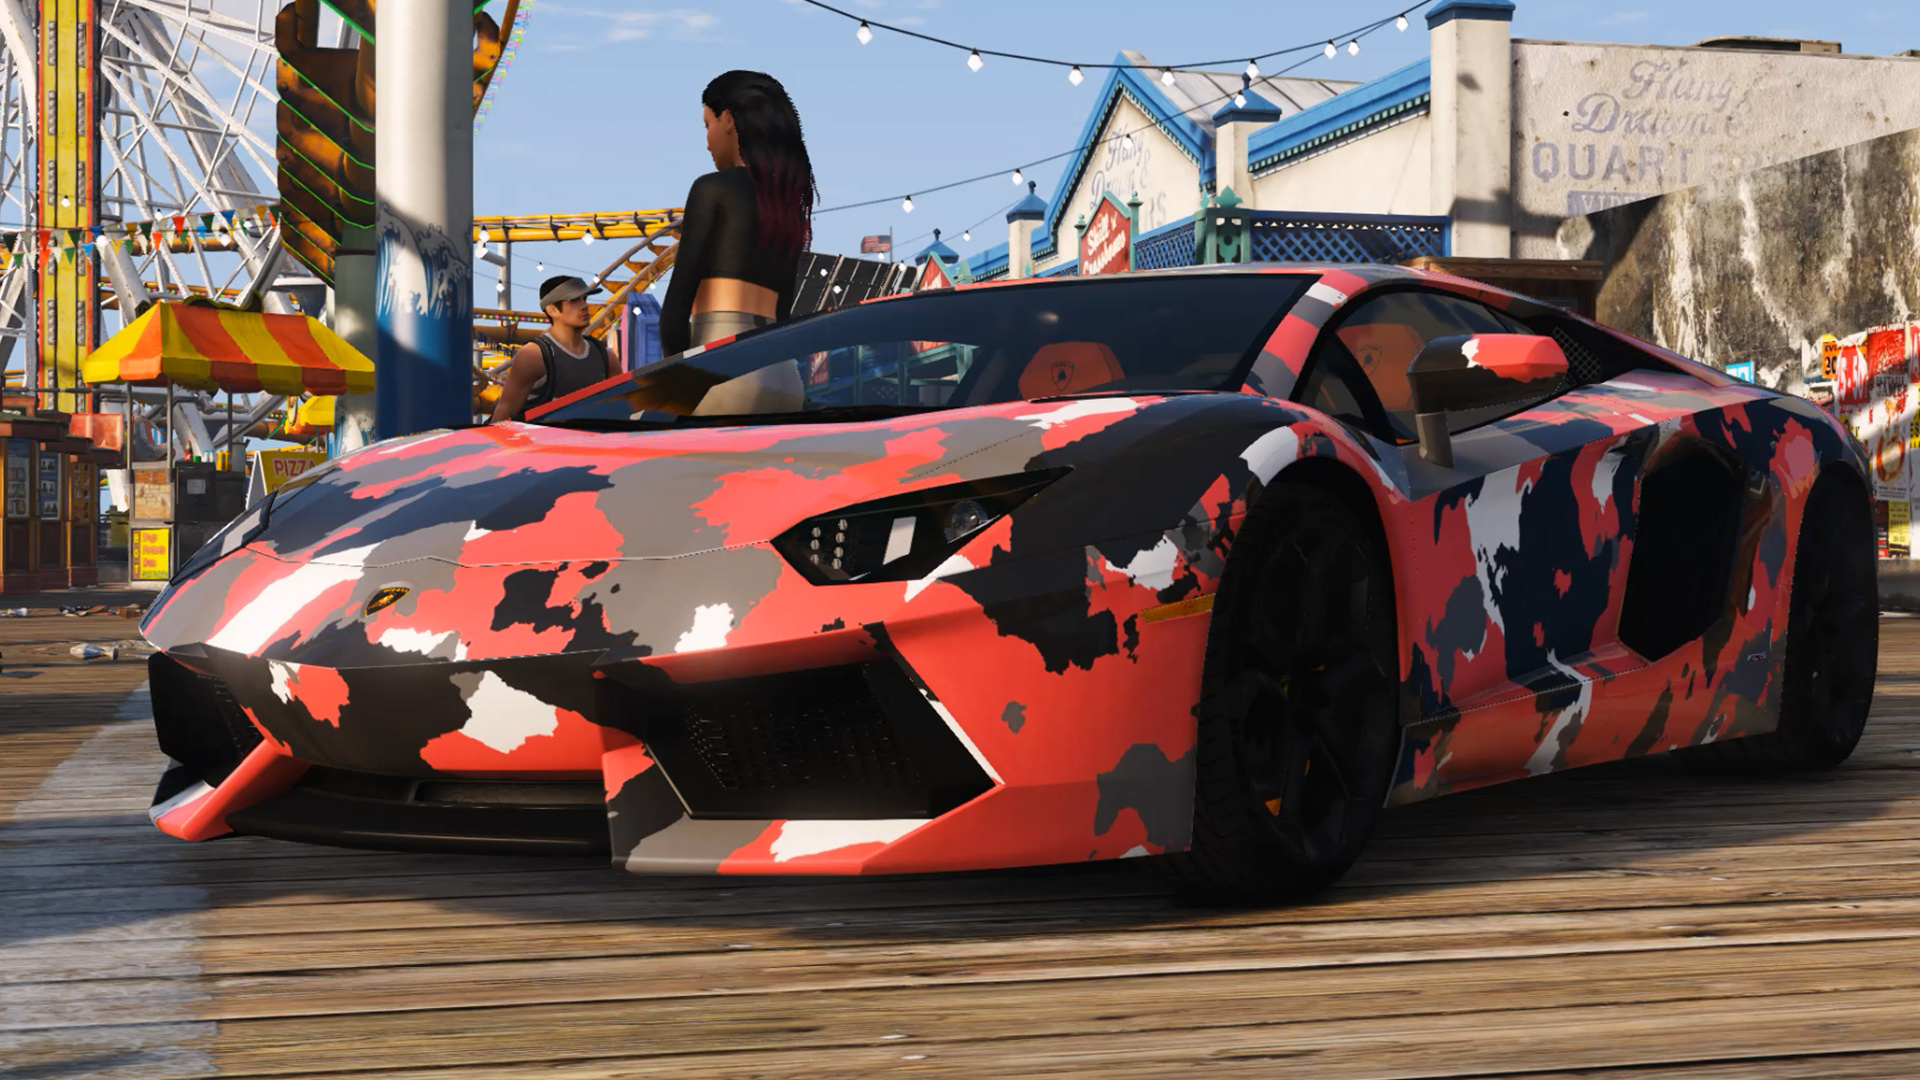 Lamborghini Aventador LP700-4 Camo PaintJob |HQ| - GTA5-Mods.com on hummer h1 camouflage, lamborghini gallardo reventon kit, jeep wrangler camouflage, lamborghini gallardo camouflage, lamborghini cars camouflage, lamborghini camo cars,